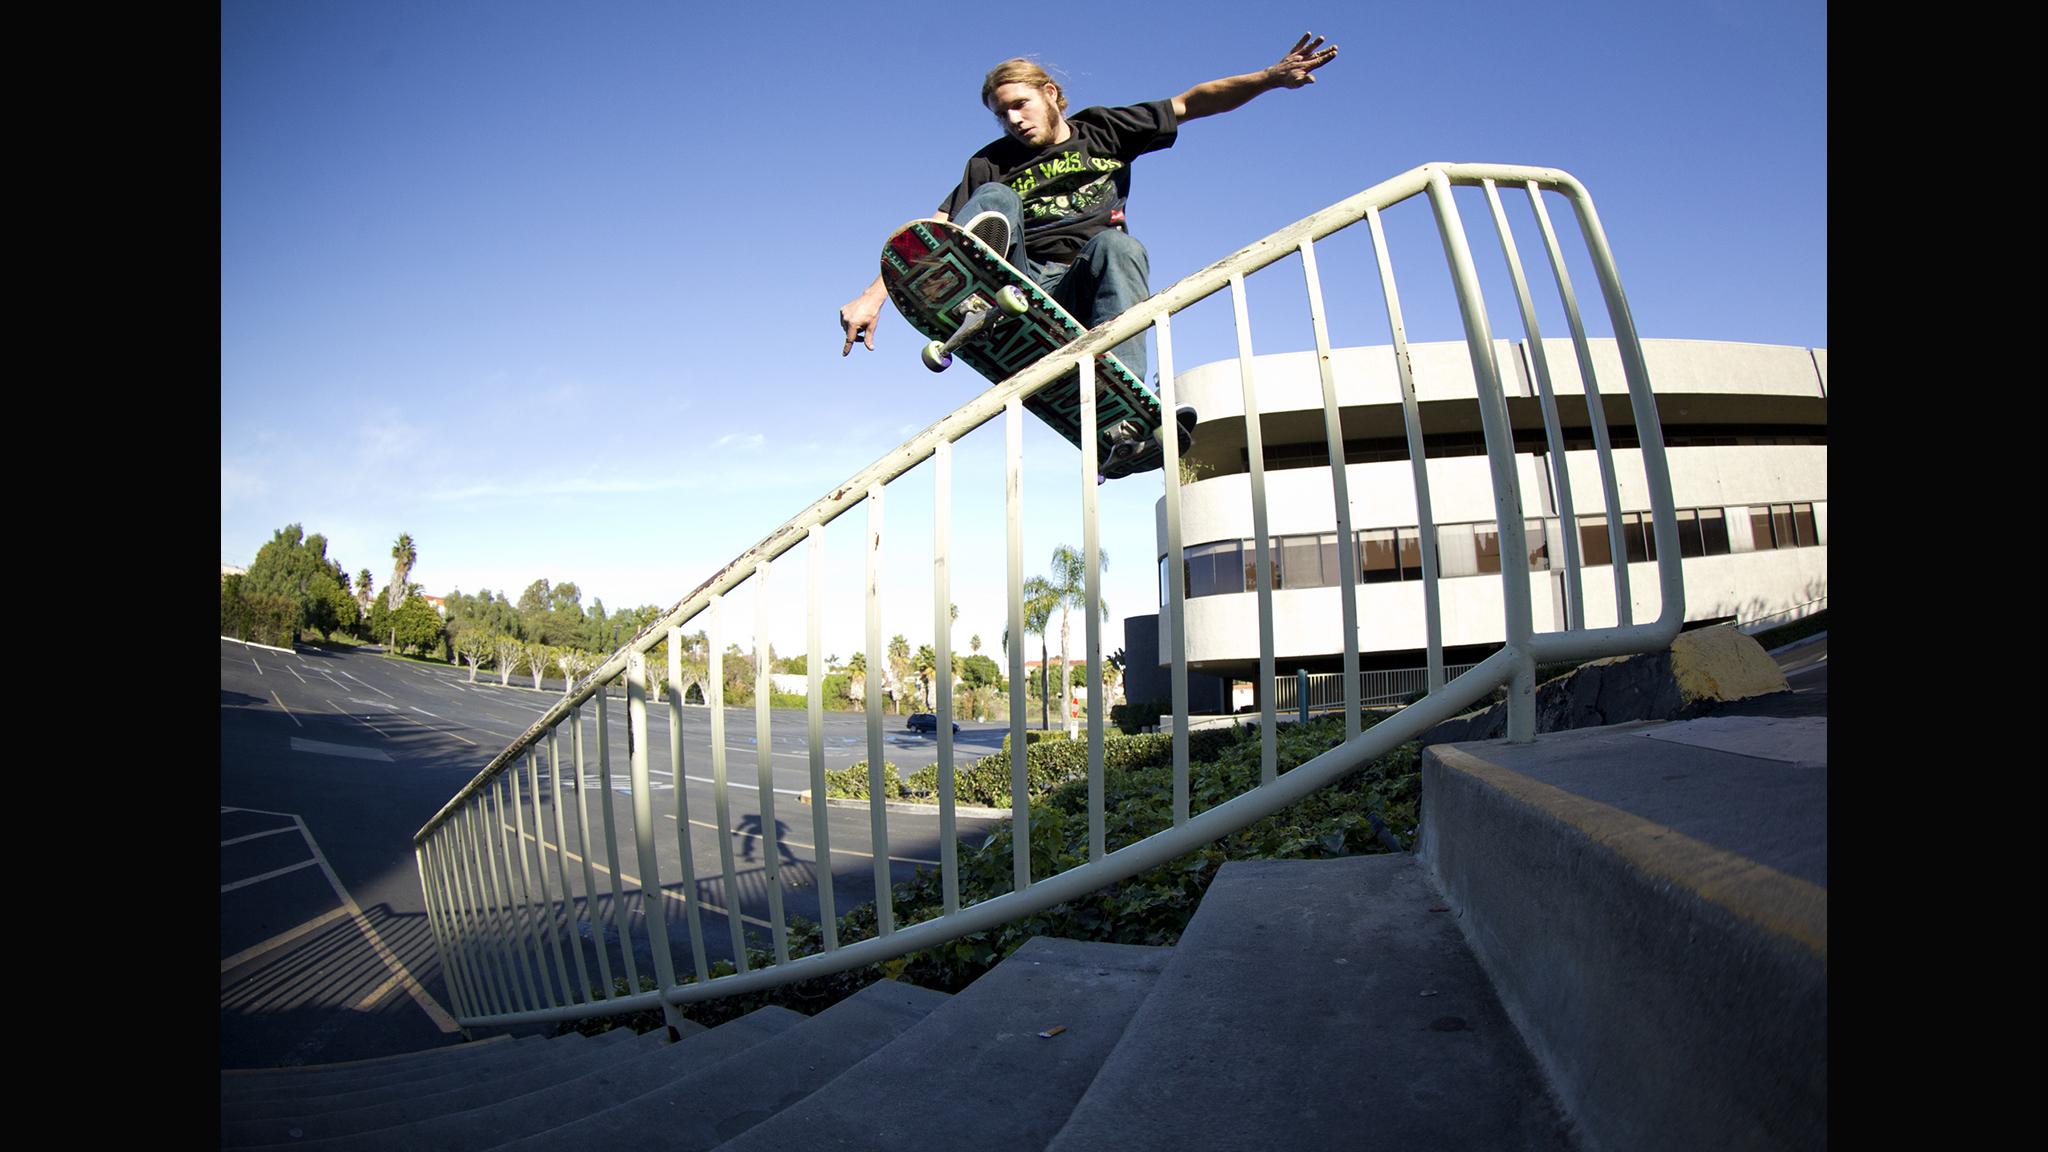 Jon Dickson, Gap to F/S boardslide